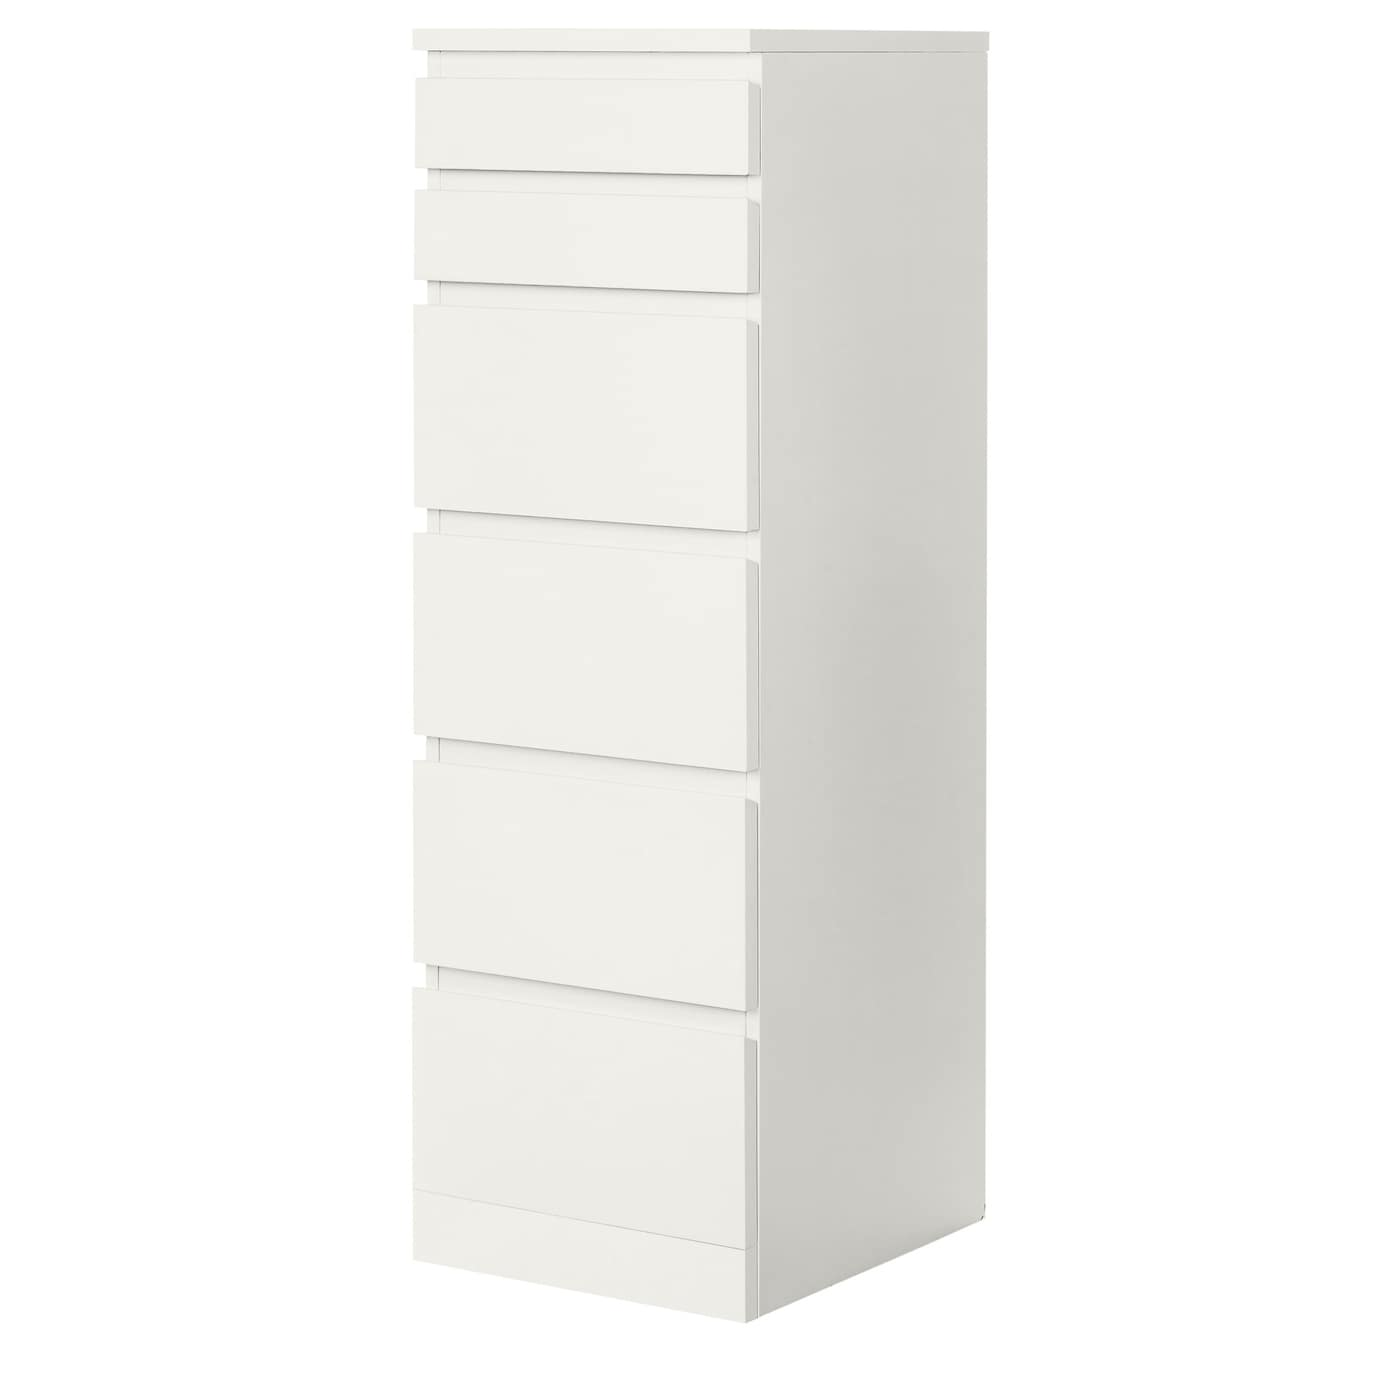 IKEA - MALM Ladekast 6 lades - 40x123 cm - Wit/spiegelglas